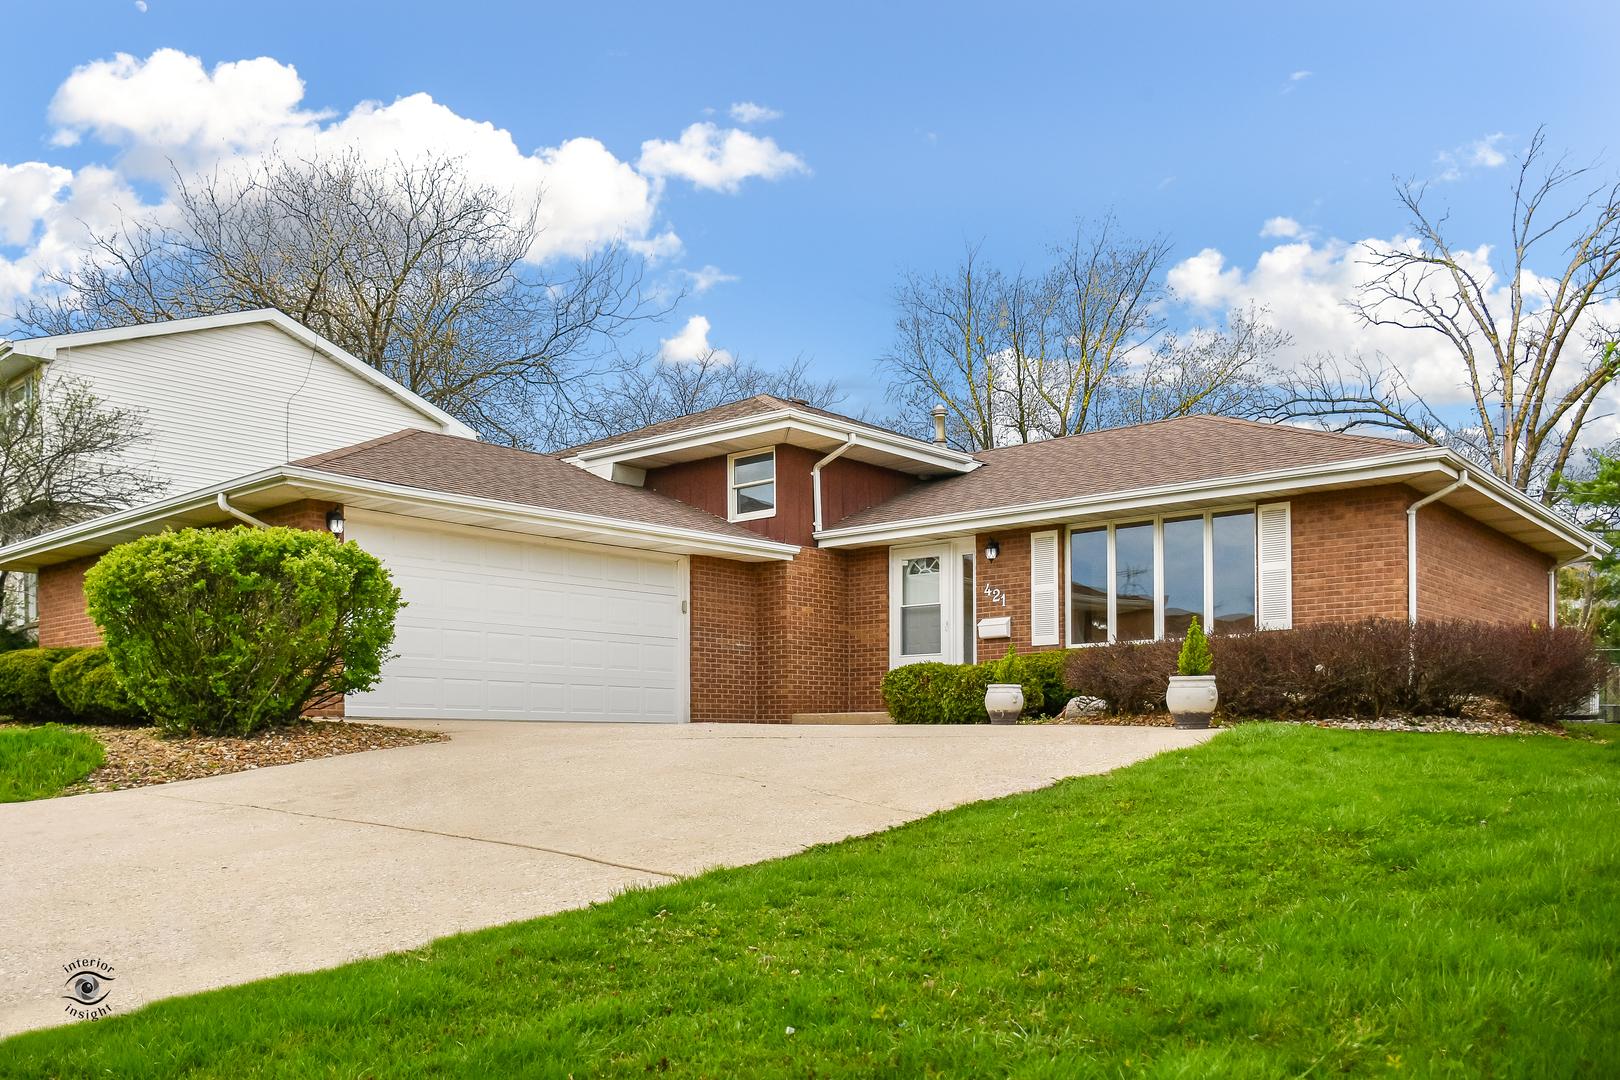 421 Glenys, LEMONT, Illinois, 60439